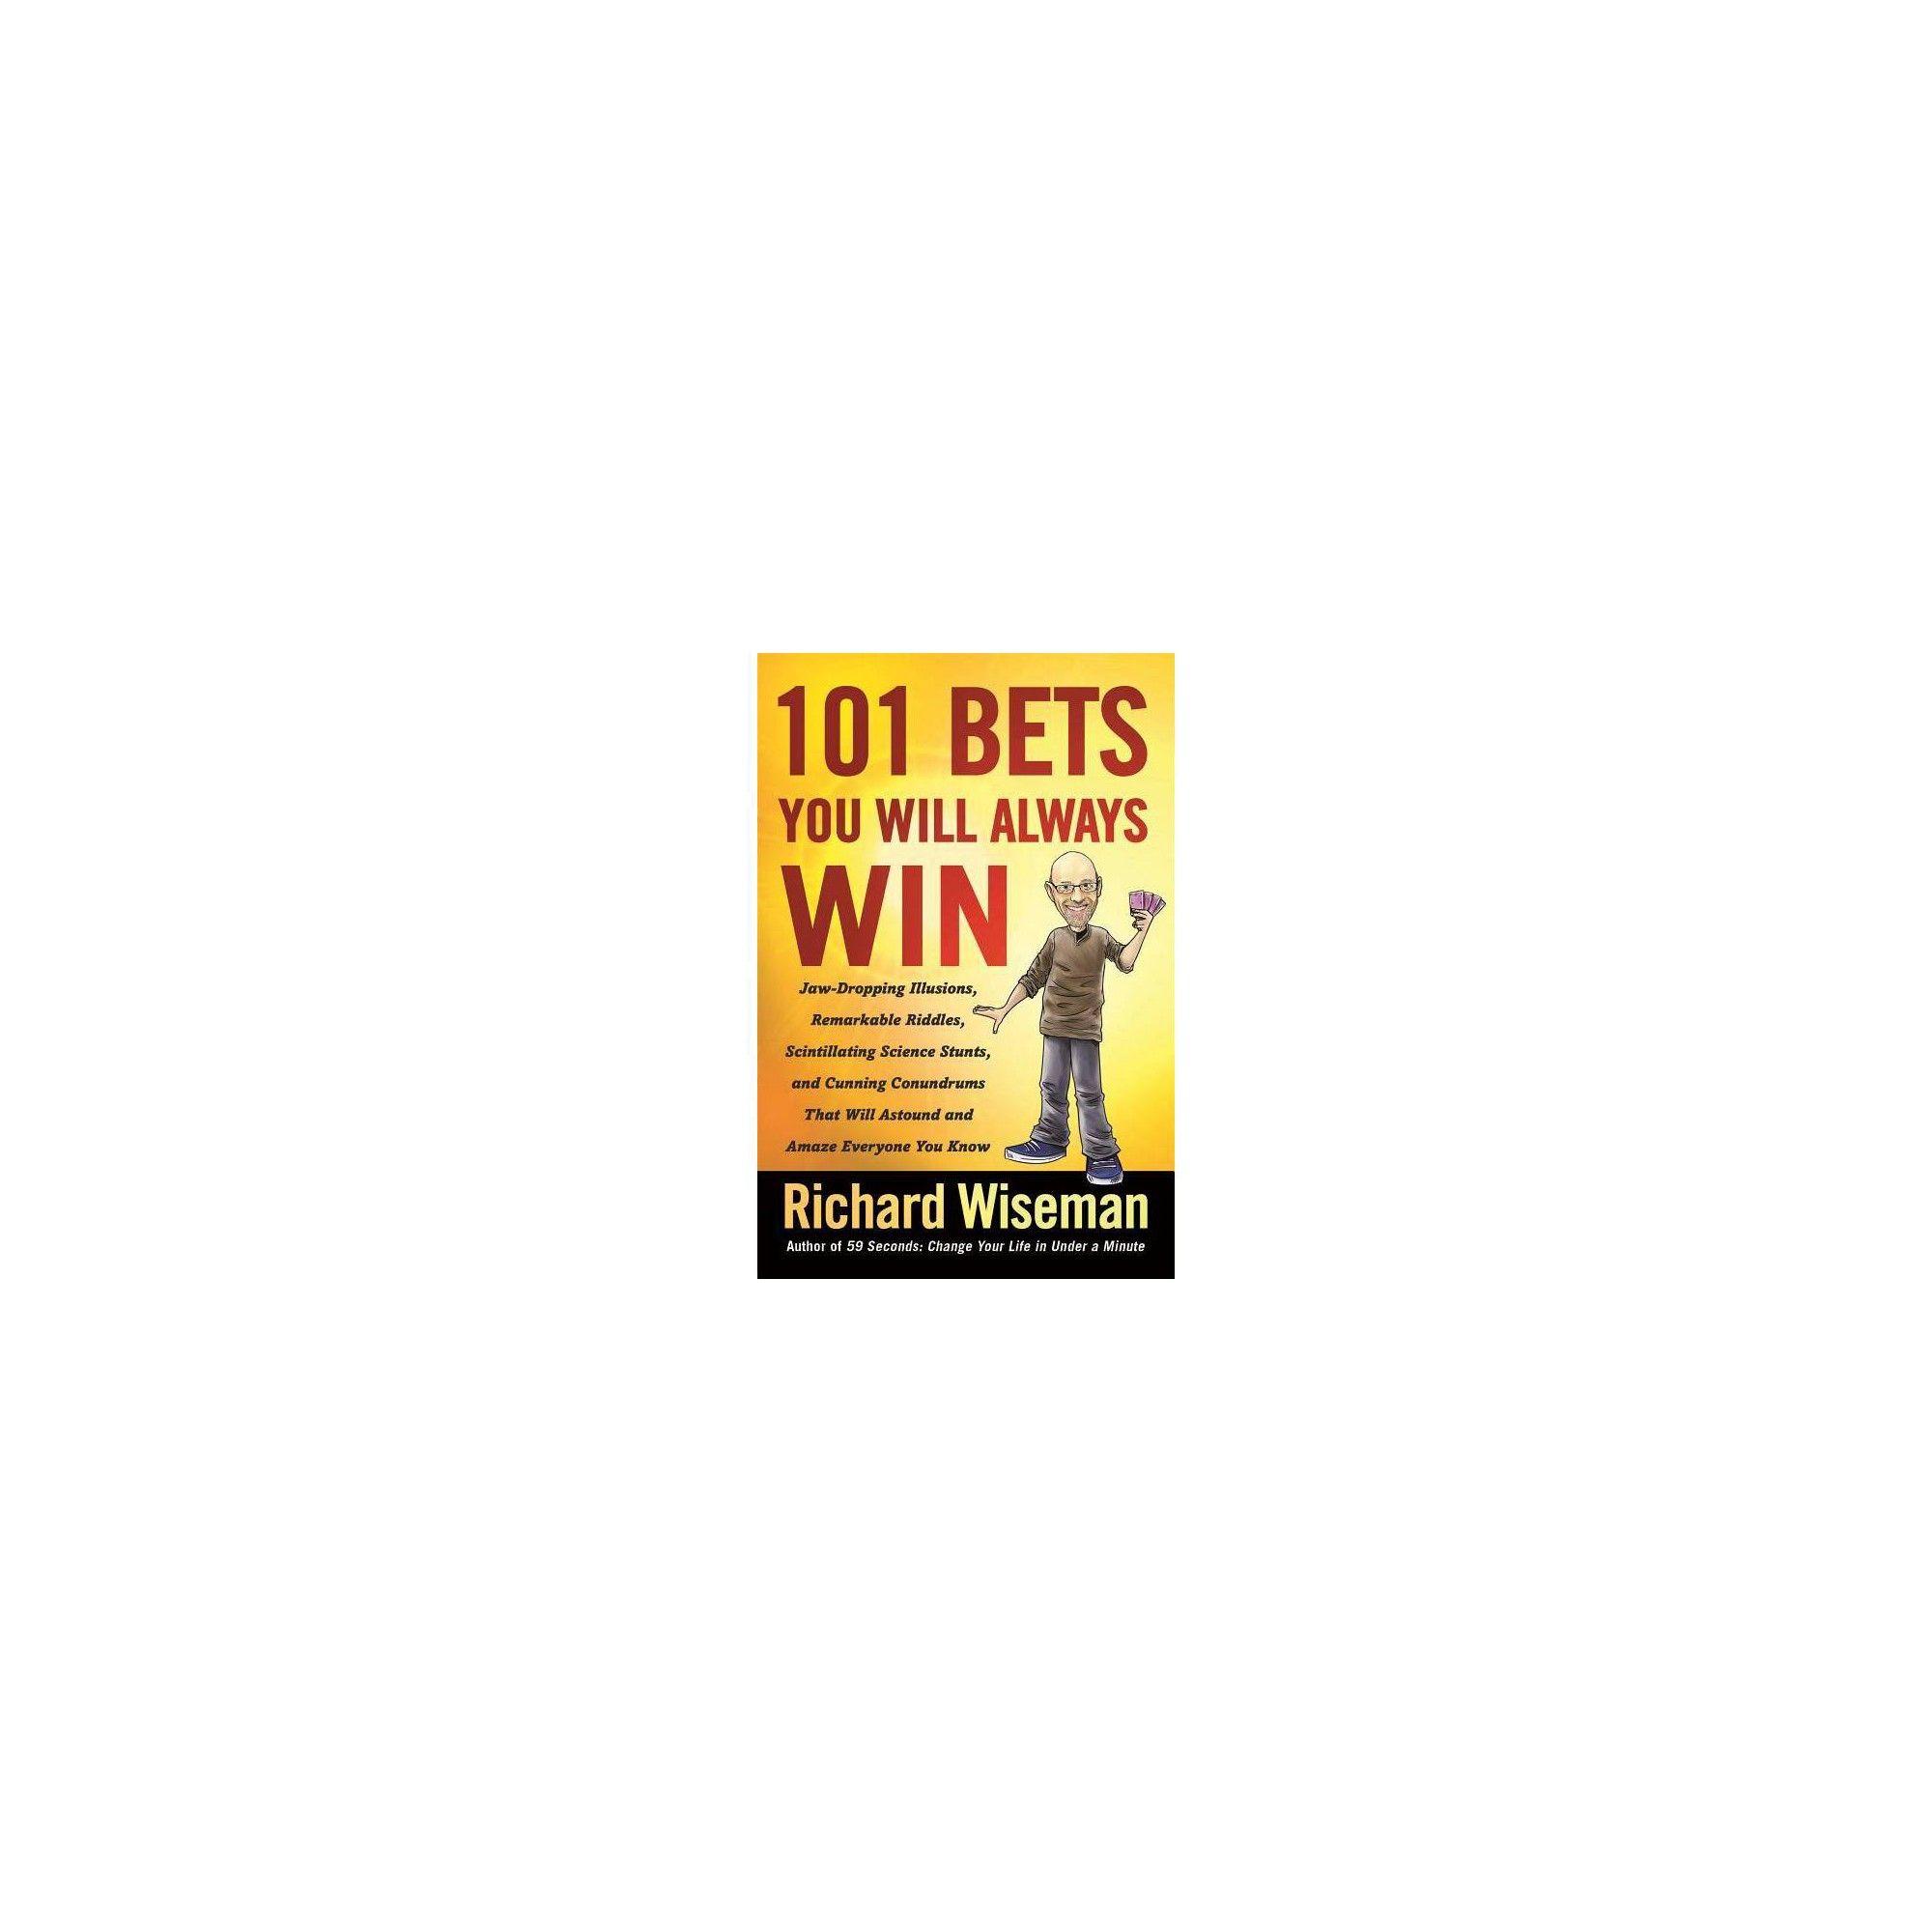 59 Seconds Richard Wiseman 101 bets you will always win -richard wiseman (paperback